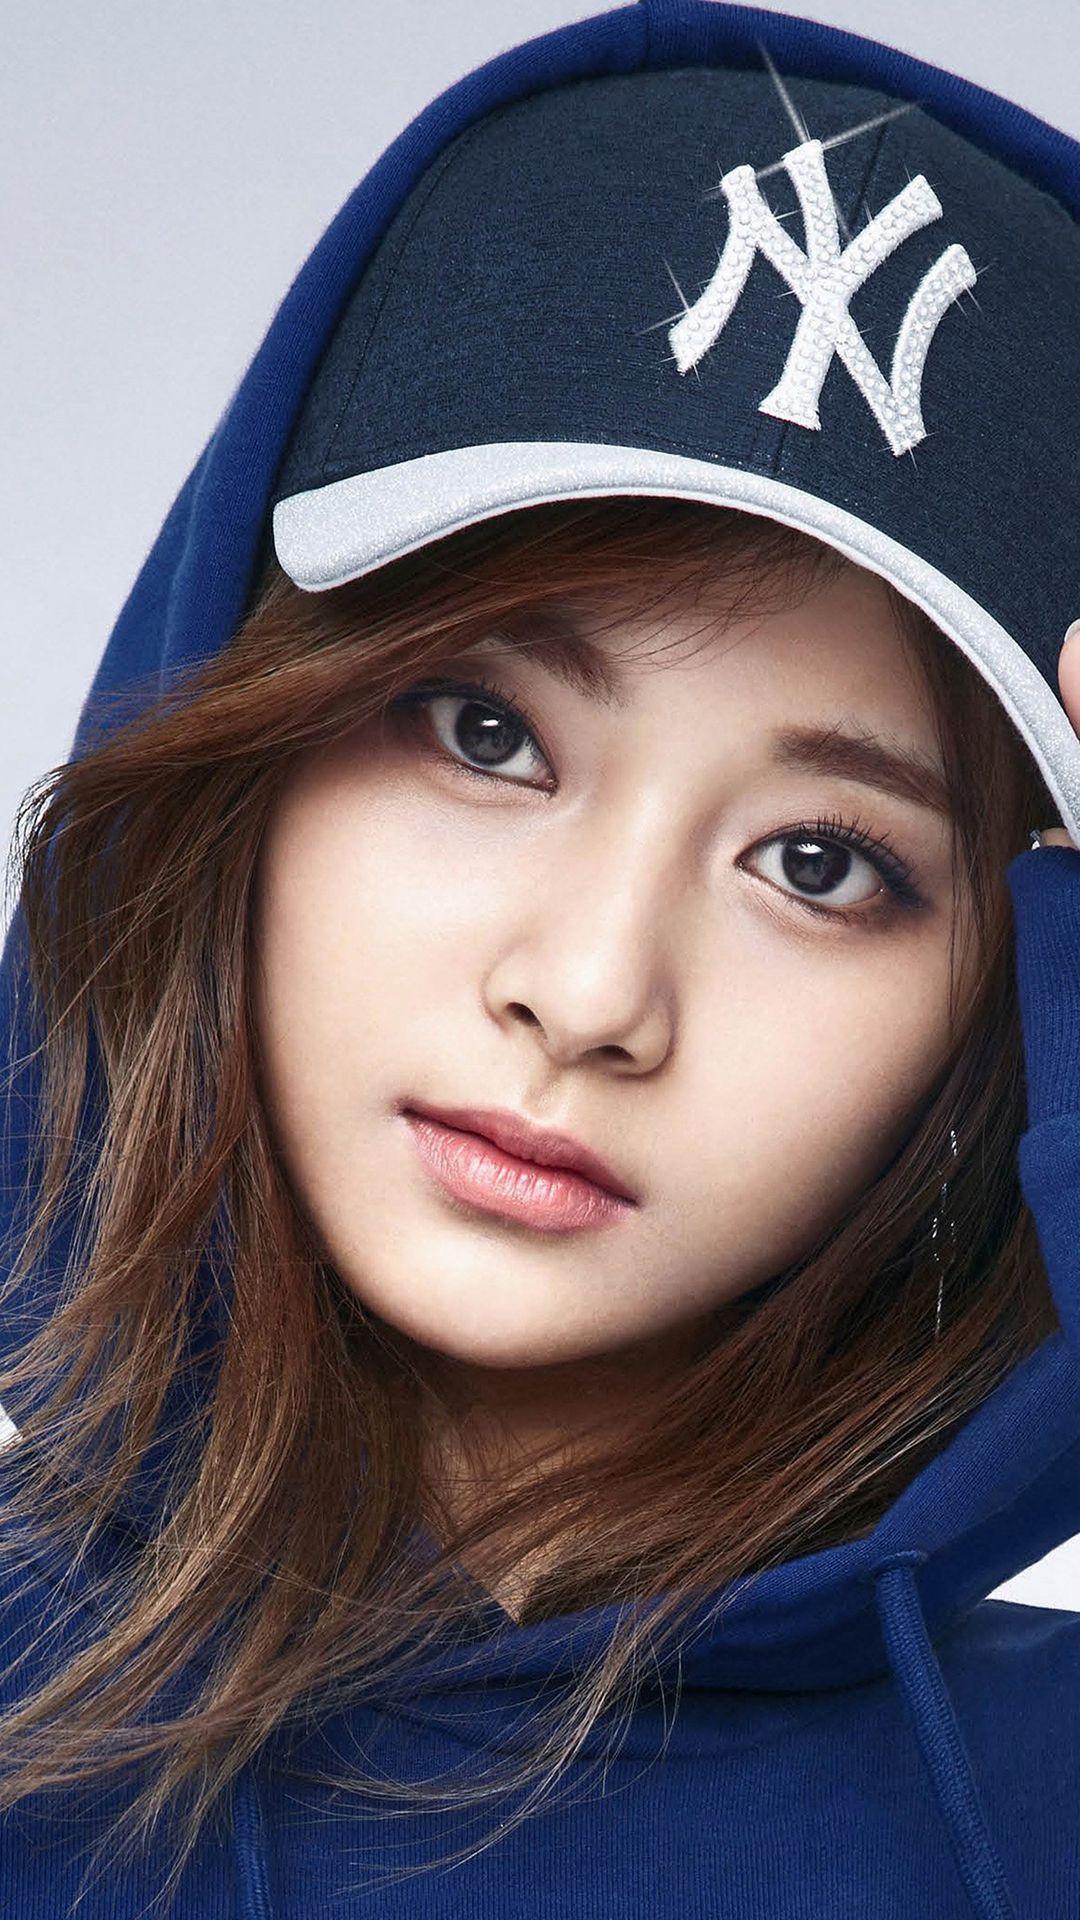 Tzuyu Kpop Girl Idol Face Iphone 6 Wallpaper Tzuyu Wallpaper Beautiful Girl Face Girl Face